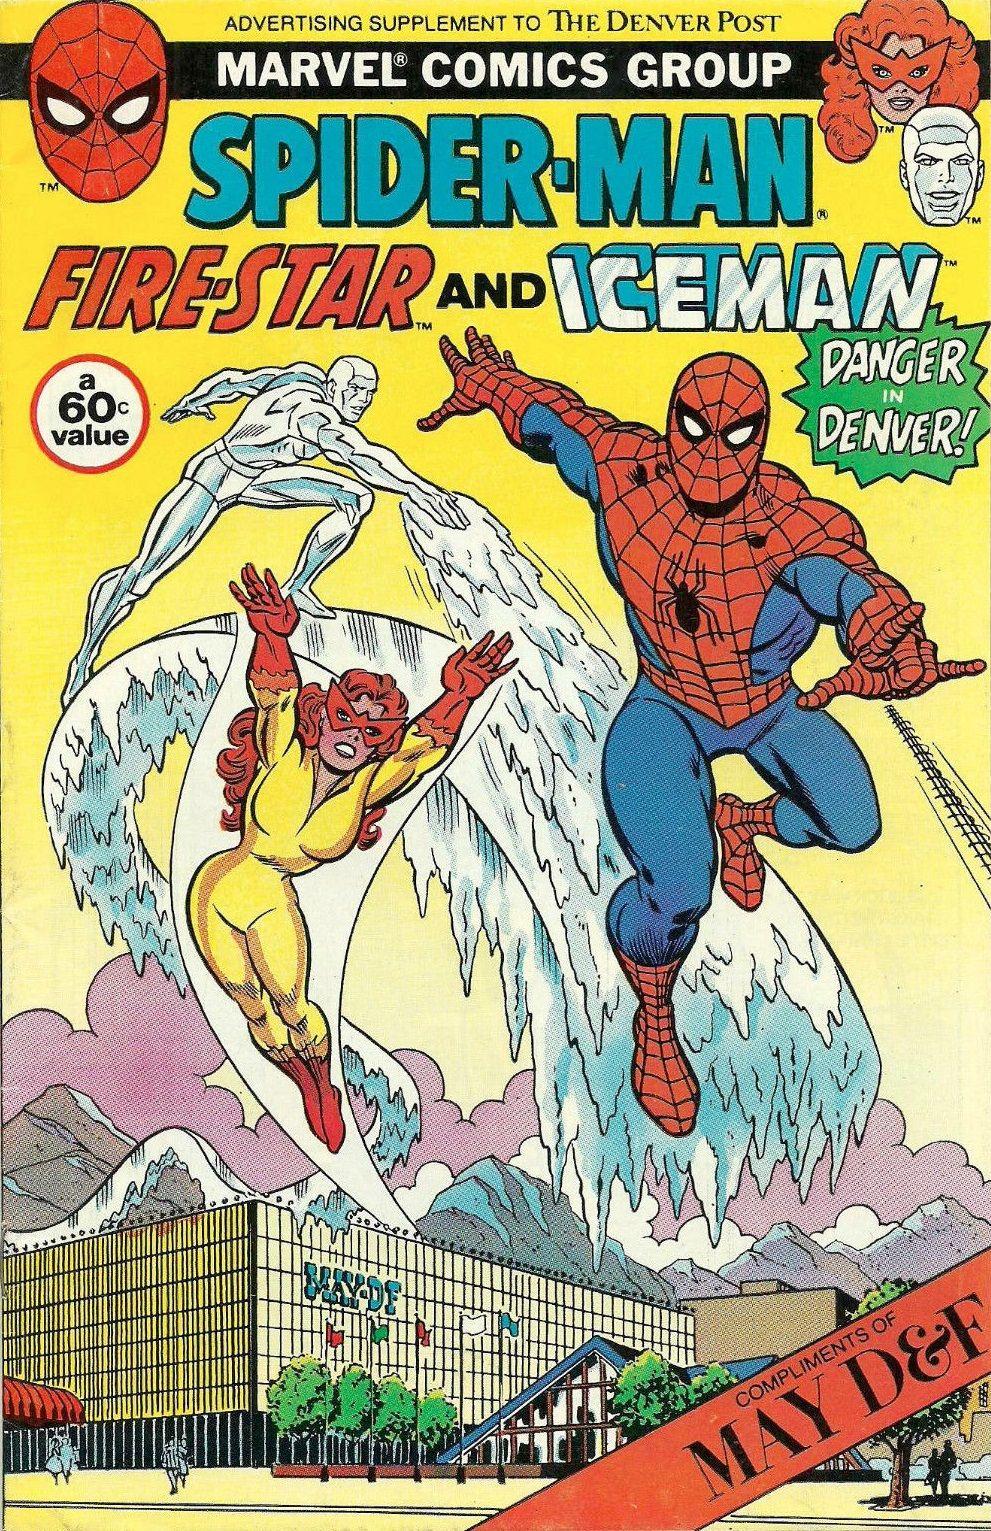 The Marvel Comics Of The 1980s 1983 Anatomy Of A Cover Denver Post Spider Man Comics Marvel Comics Superheroes 80s Cartoons